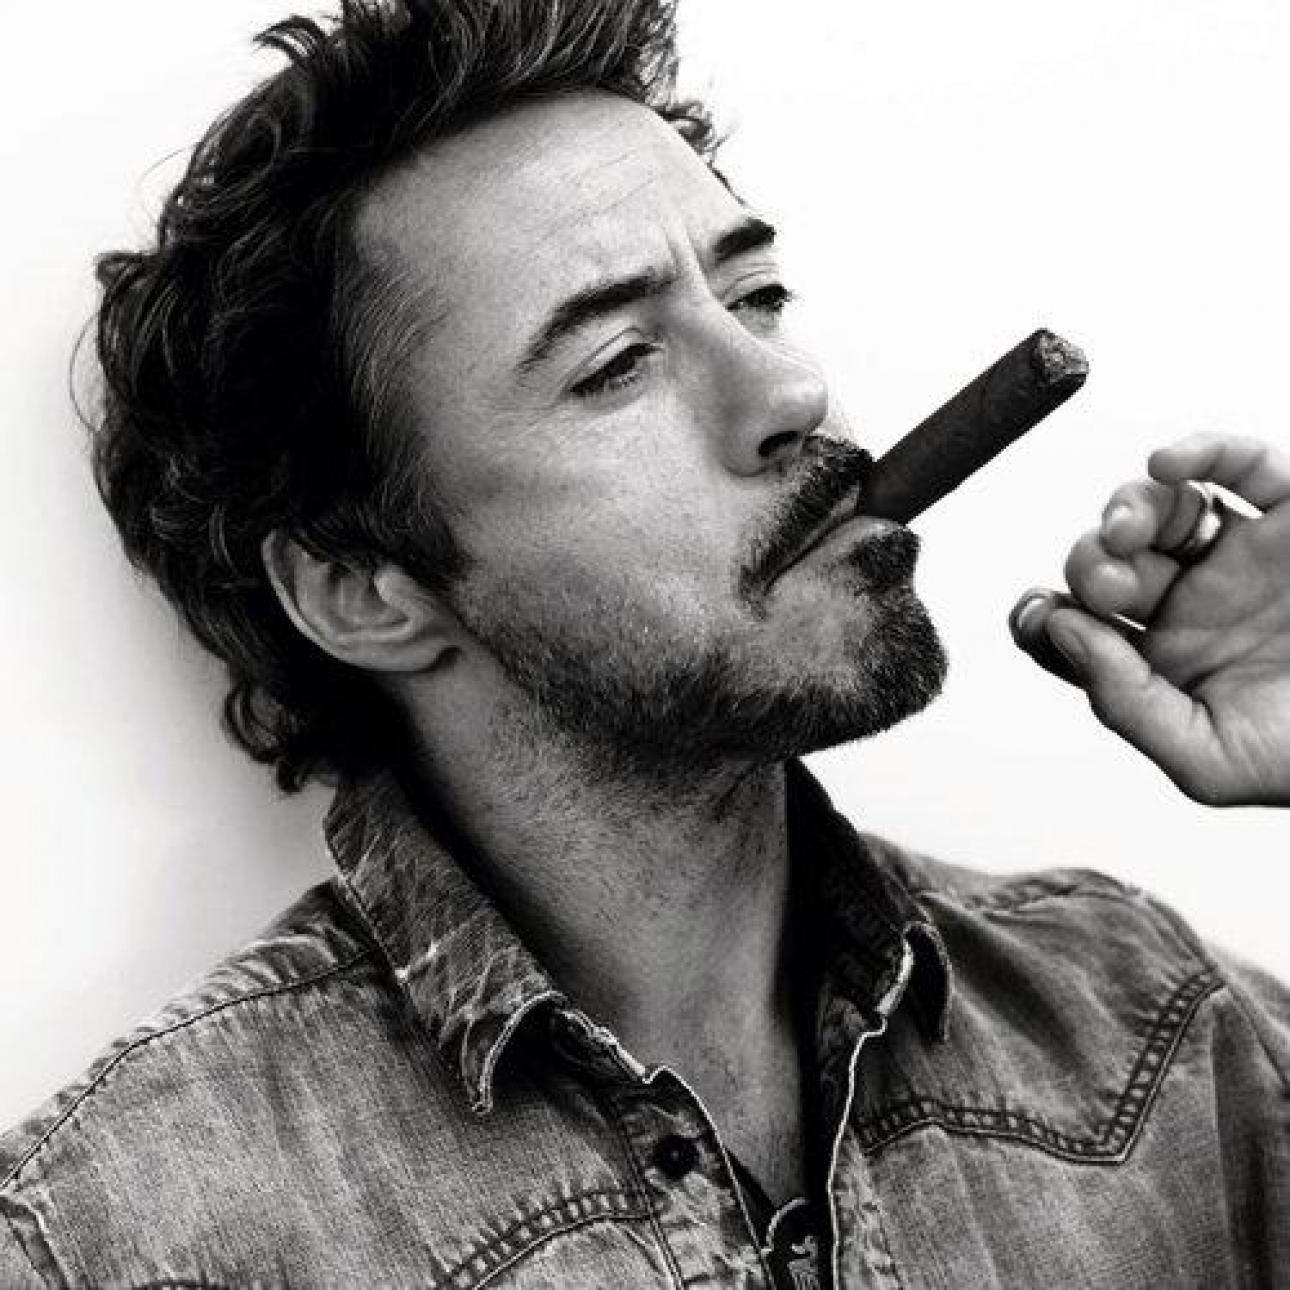 Robert Downey Jr Hd Pics Download Free Robert Downey Jr In 2019